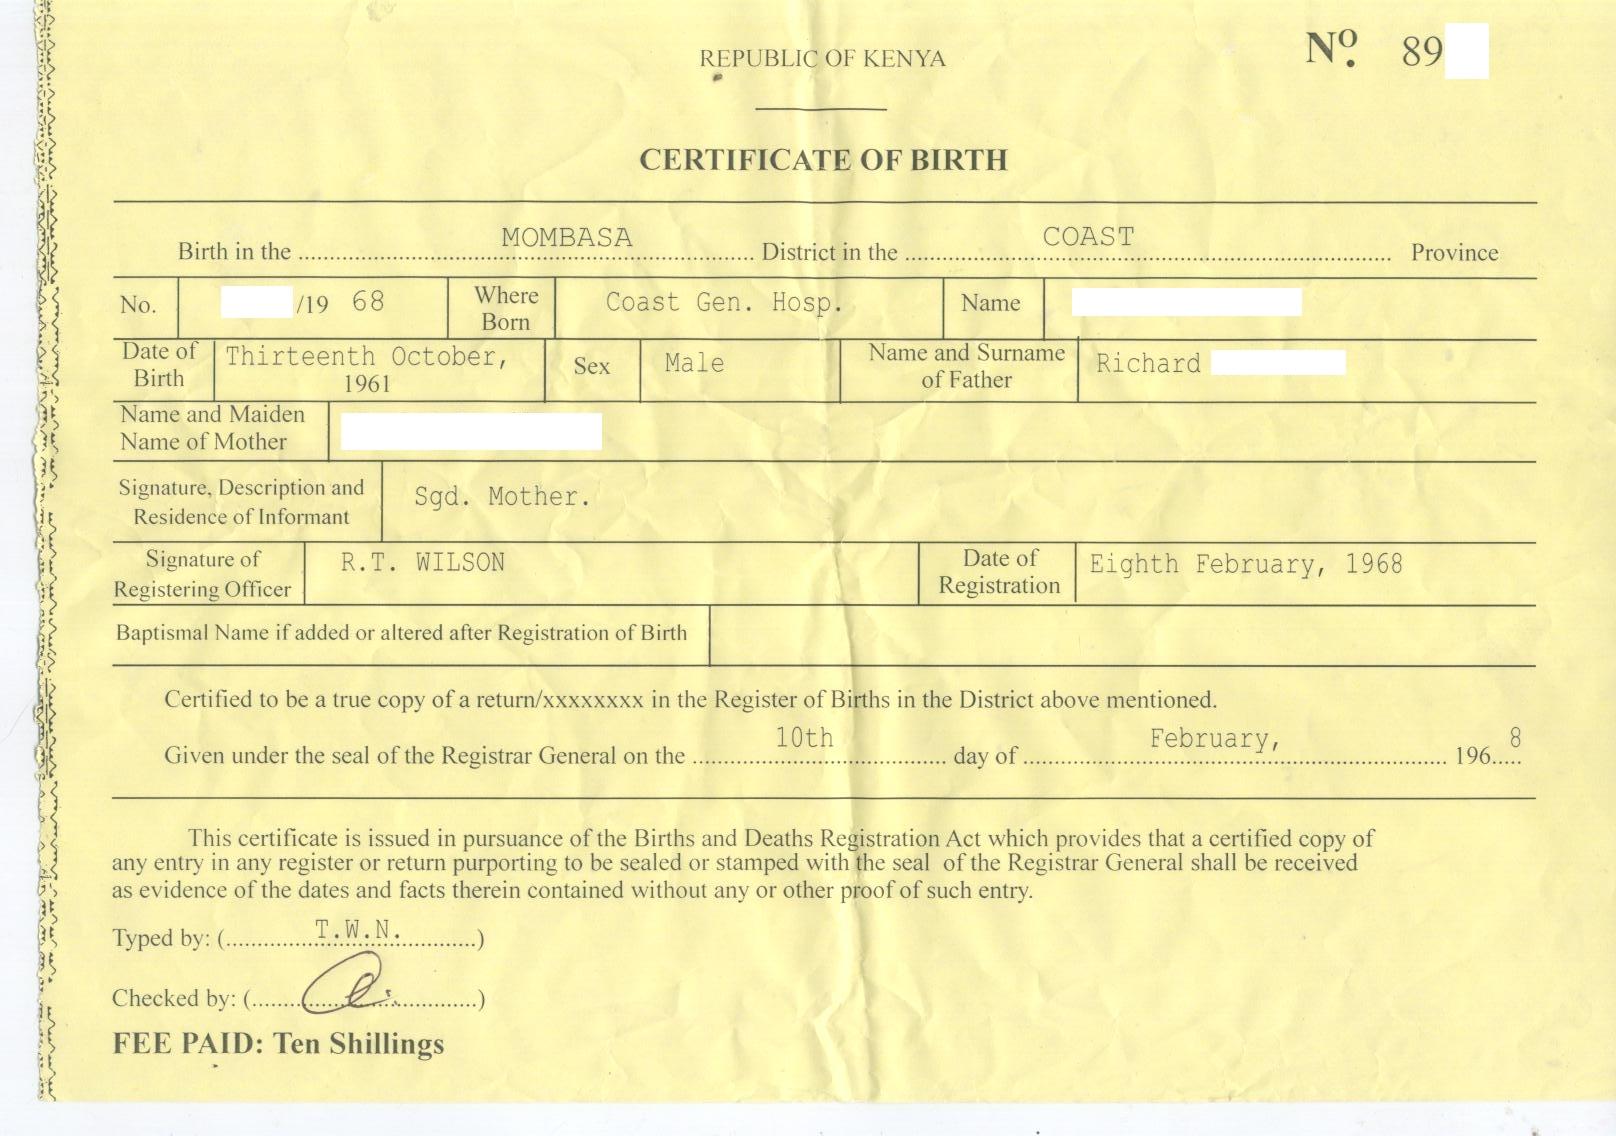 Fake Birth Certificate Template Online – Fake Birth Certificate Template Free